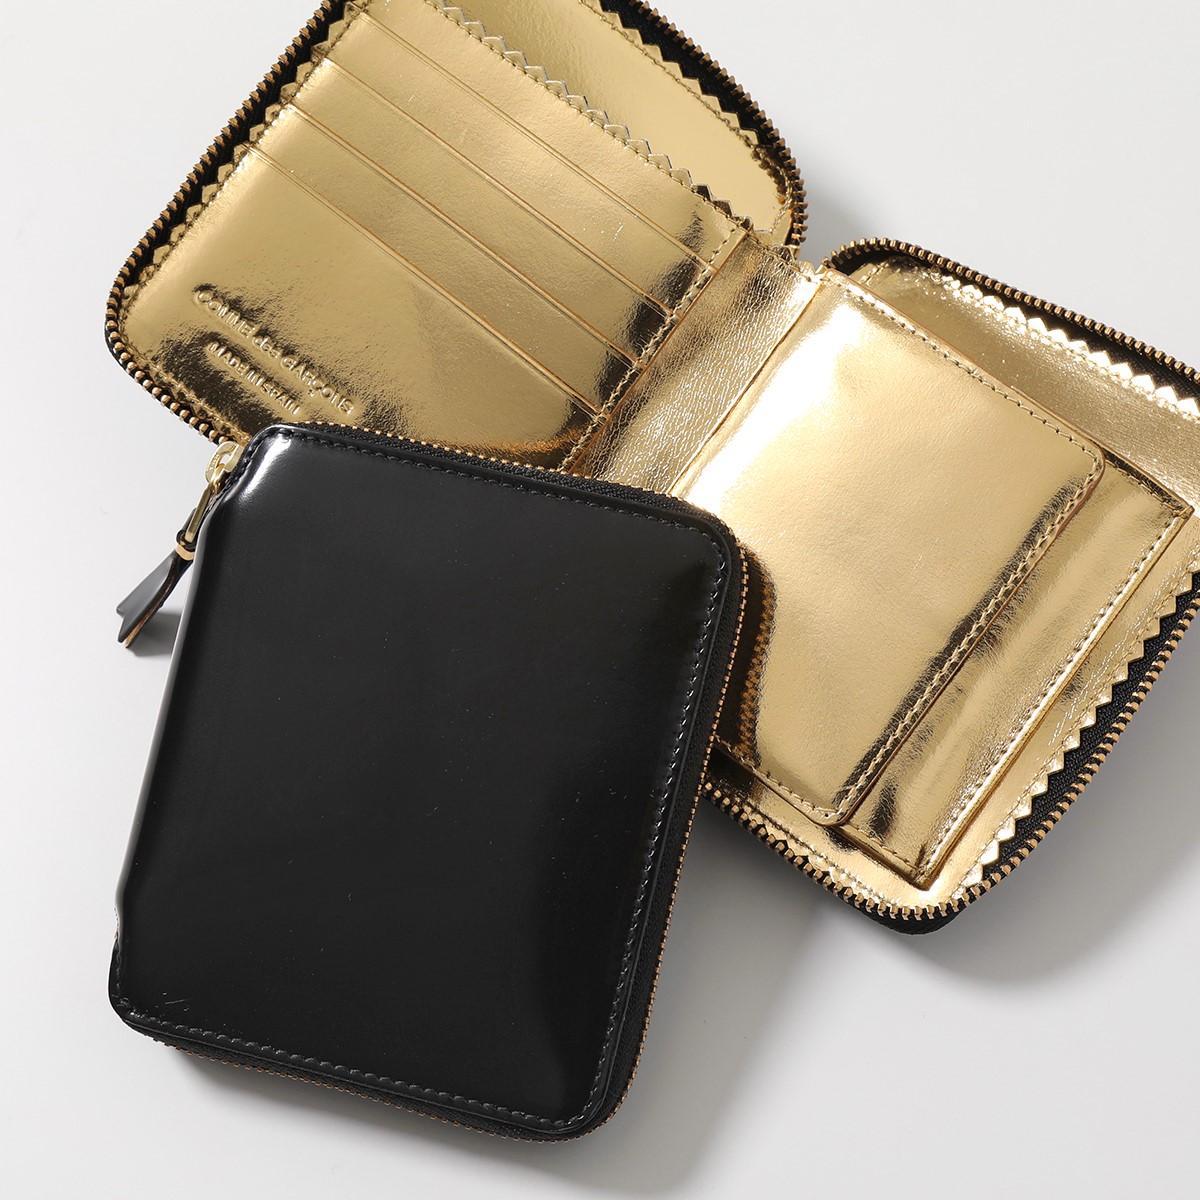 COMME DES GARCONS コムデギャルソン SA2100MI レザー 二つ折り財布 ミディアム スモール財布 GOLD ユニセックス